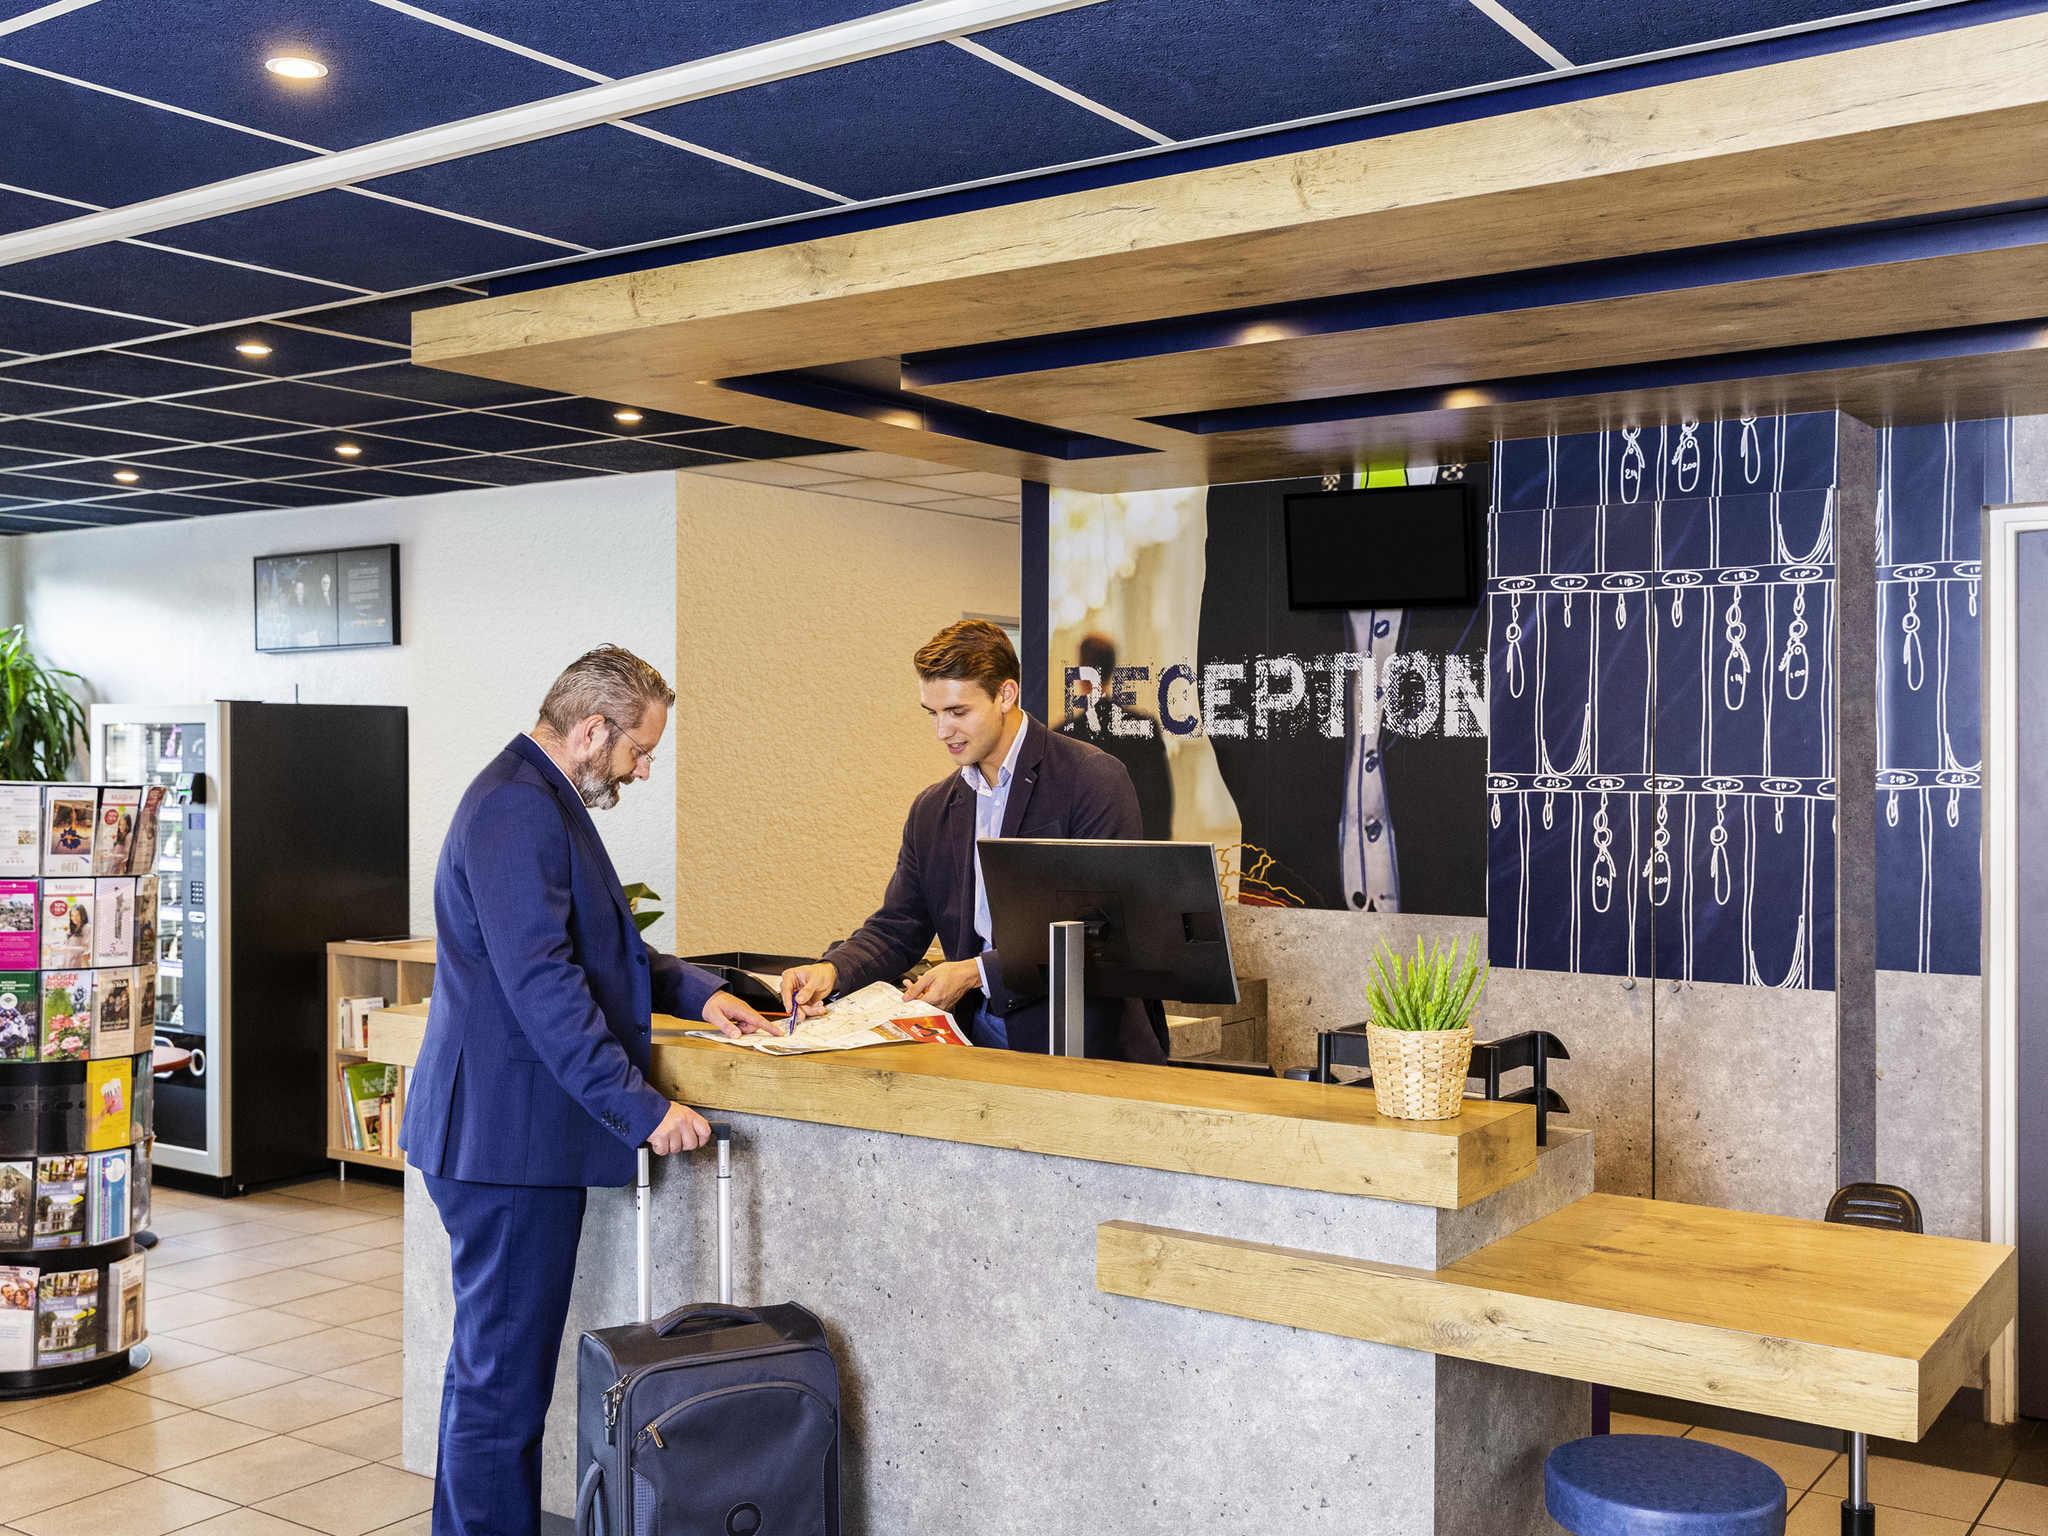 Hotel in le kremlin bicetre ibis budget paris porte d for Porte d italie sarreguemines